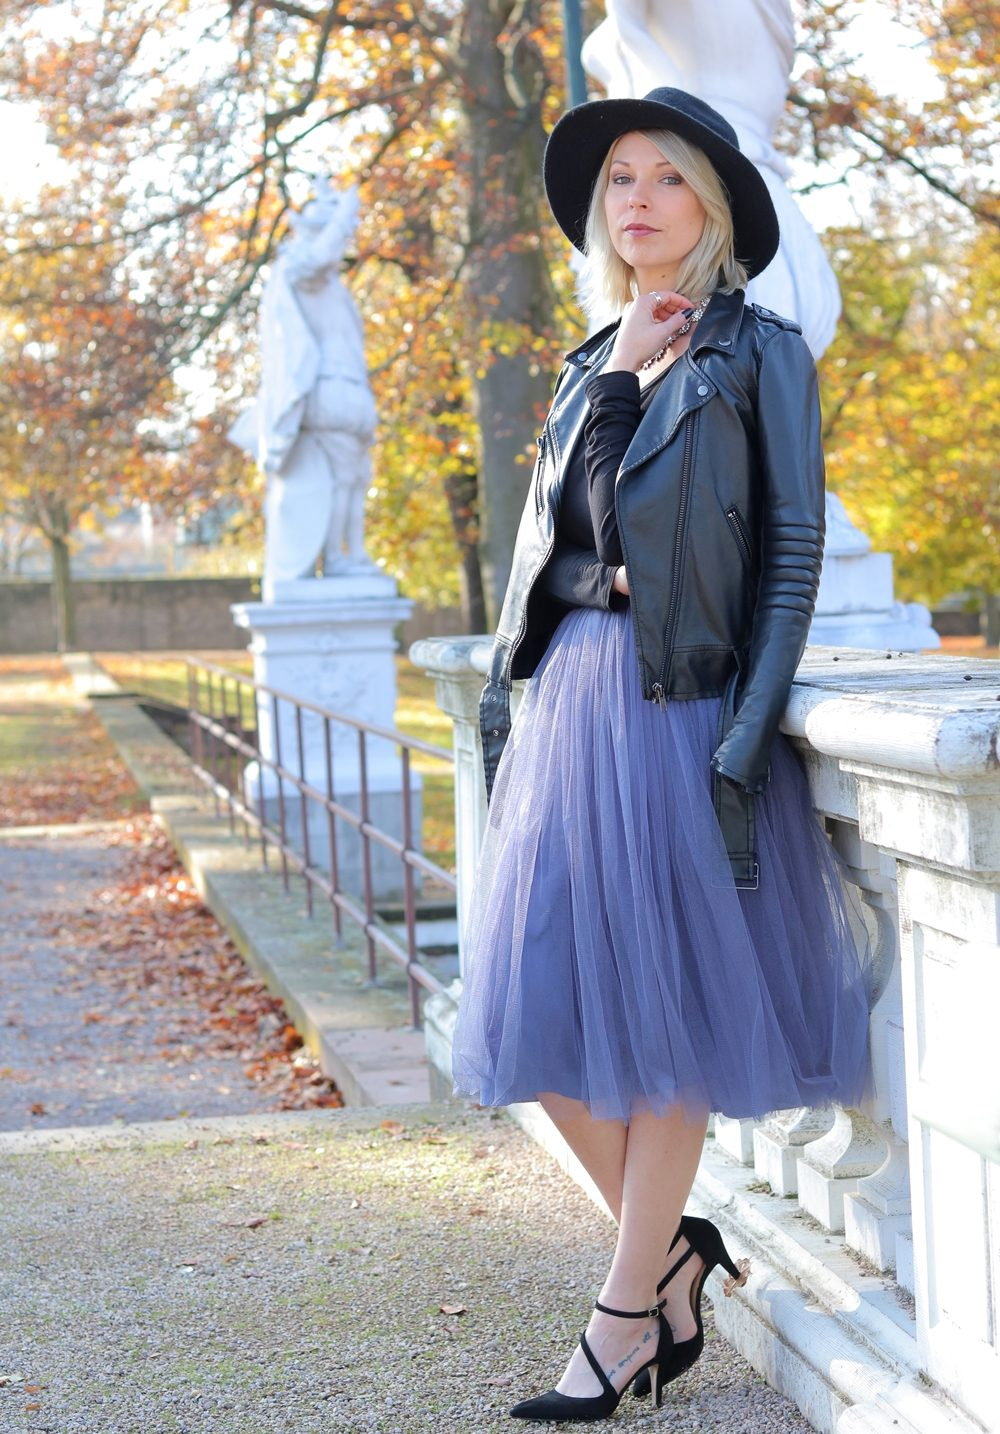 fashionblogger-karlsruhe-outfit-lila-tuellrock-asos-shirt-pumps-tamaris-schwarzer-hut-24